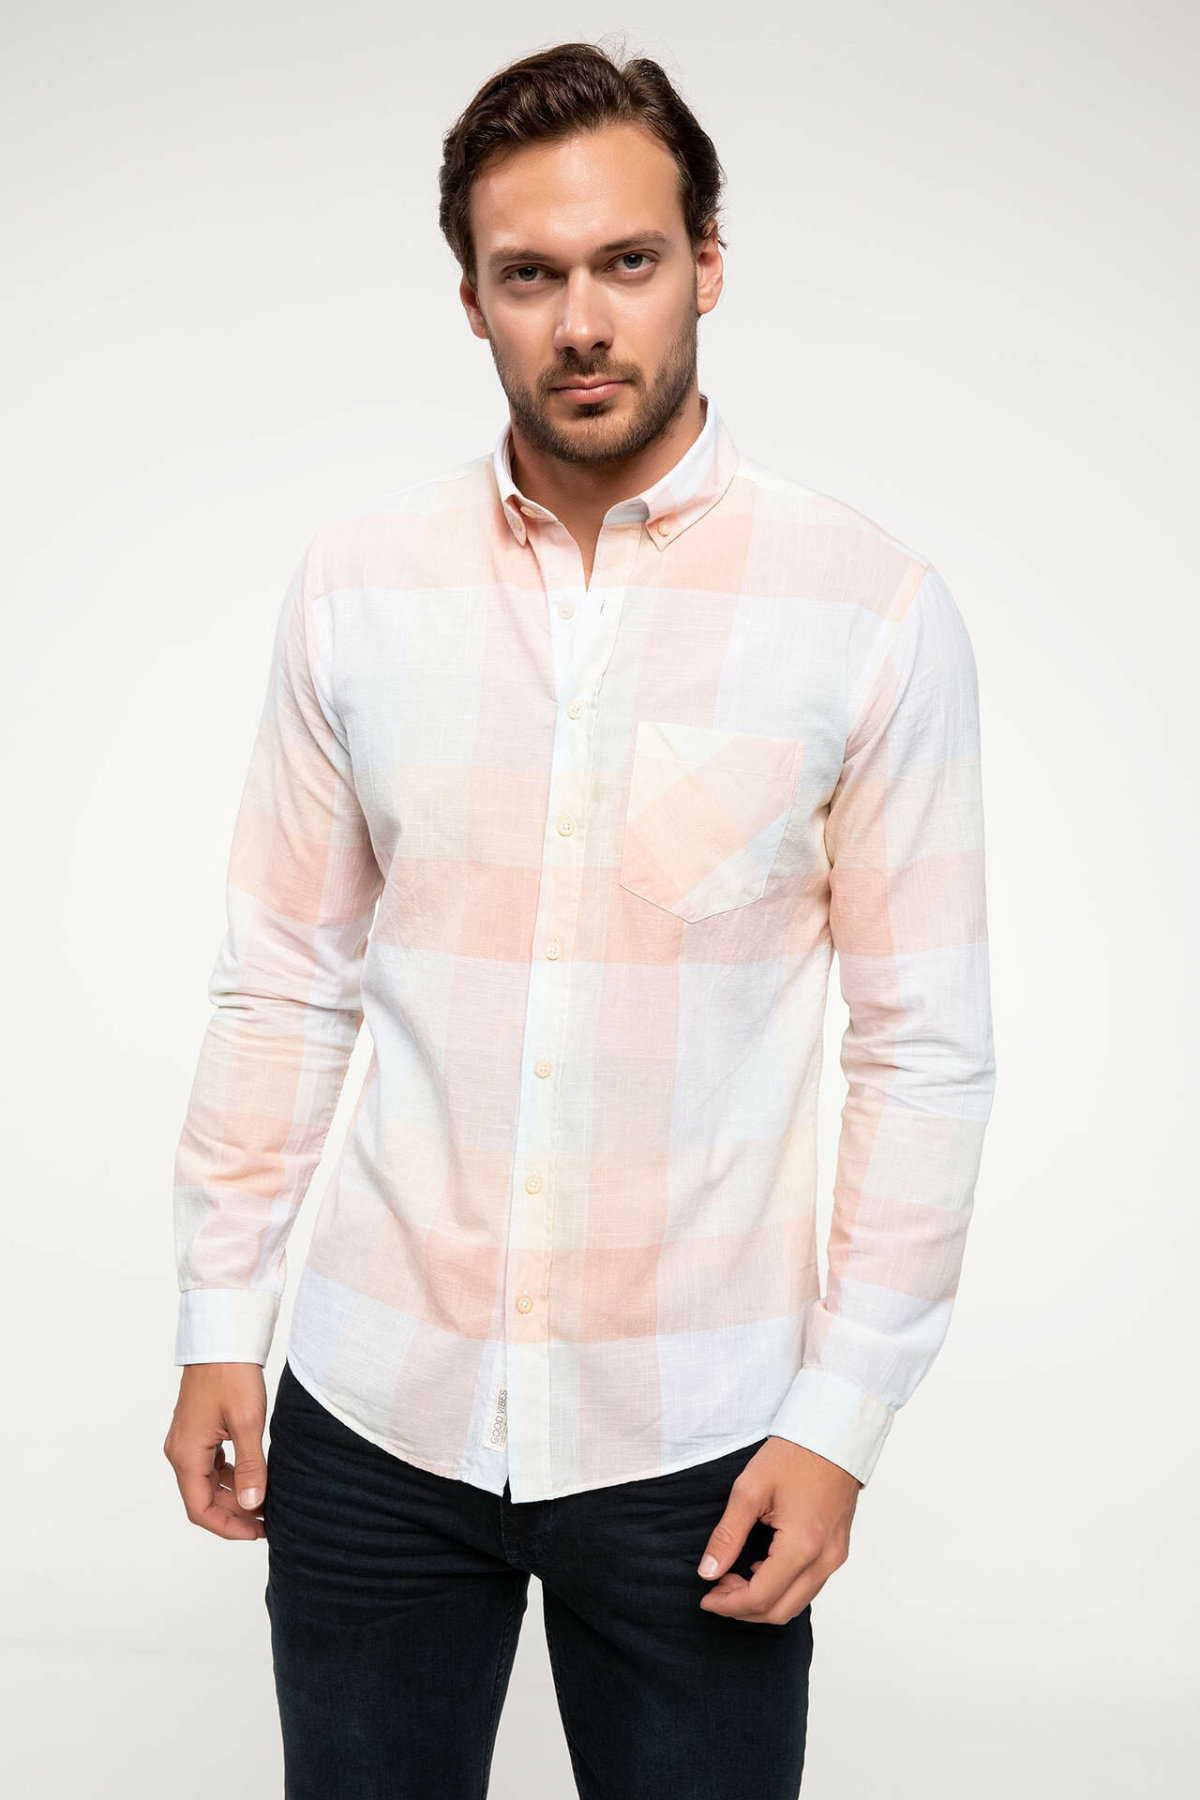 DeFacto Smart Casual Men Blue Plaid Shirt Woven Top Long Sleeve Classical Pocket Cotton Shirt Tops-I4652AZ18SM